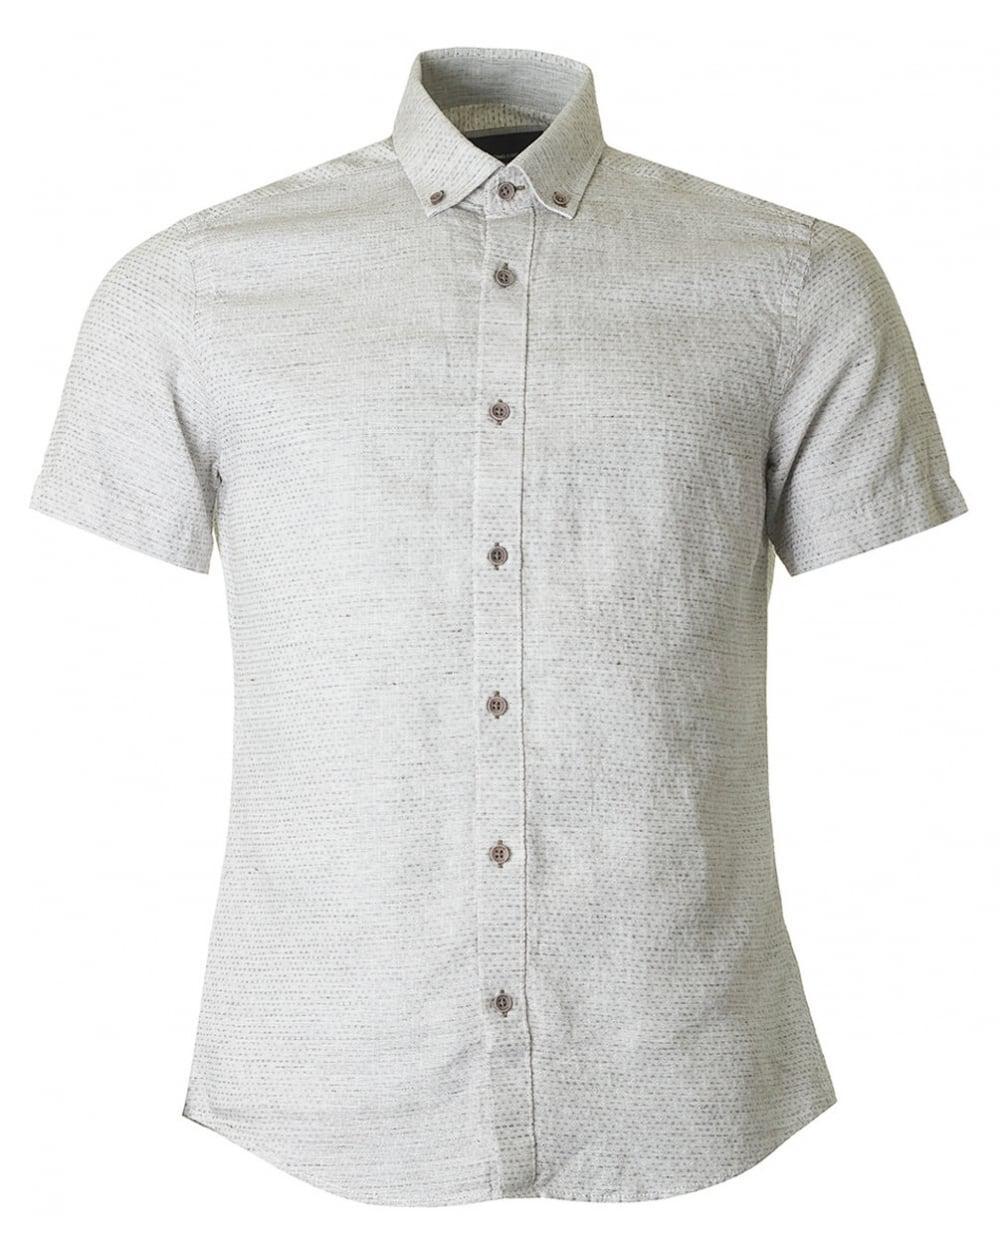 130c781ffaff Remus Uomo Textured Short Sleeved Shirt in Green for Men - Lyst